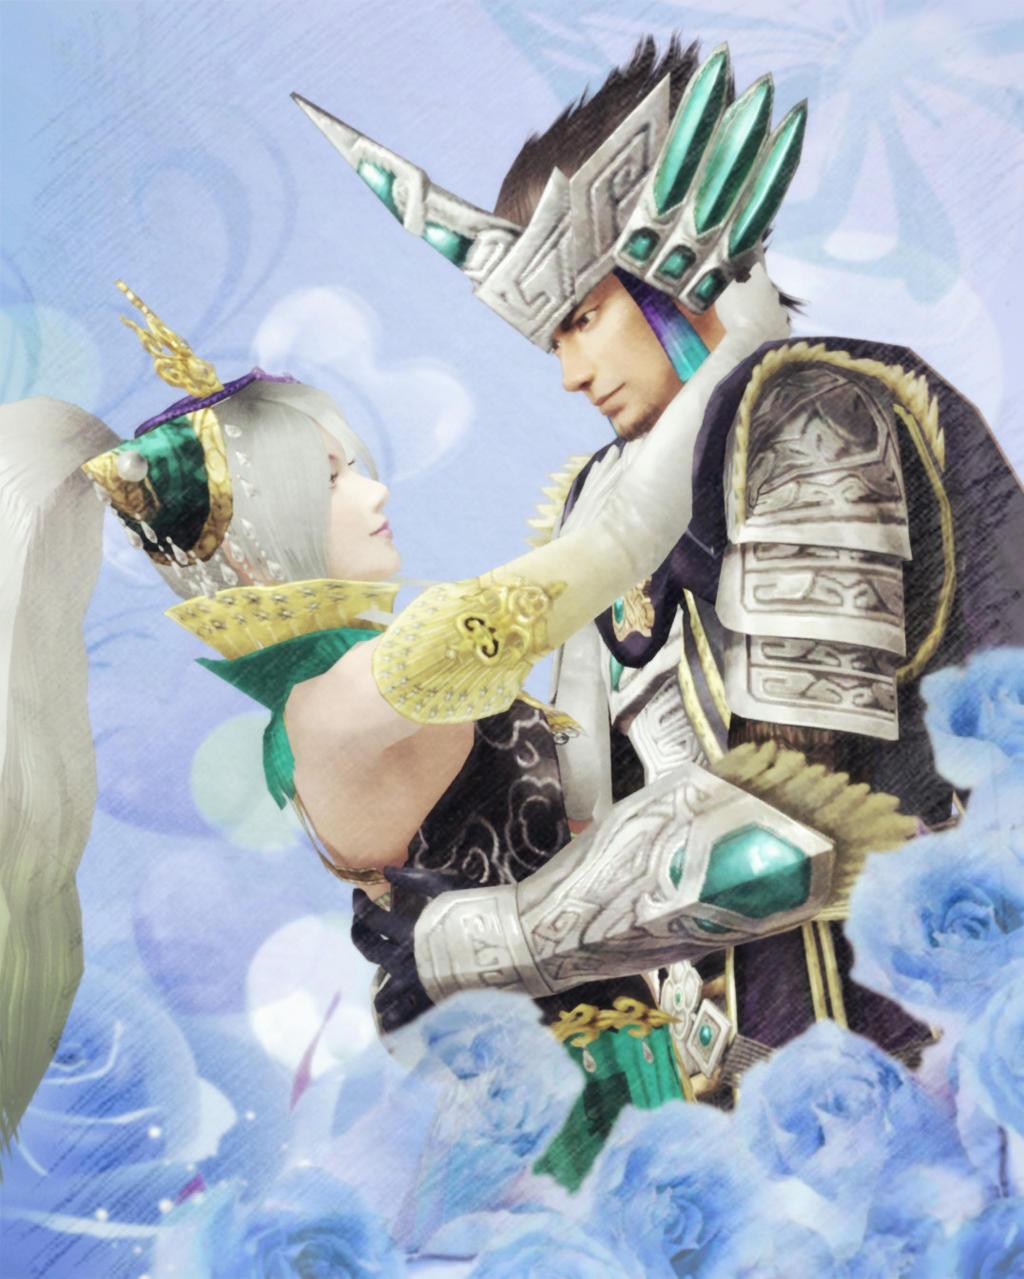 Warriors Orochi 3 Wallpaper: Fuxi X Nuwa By A821618628 On DeviantArt